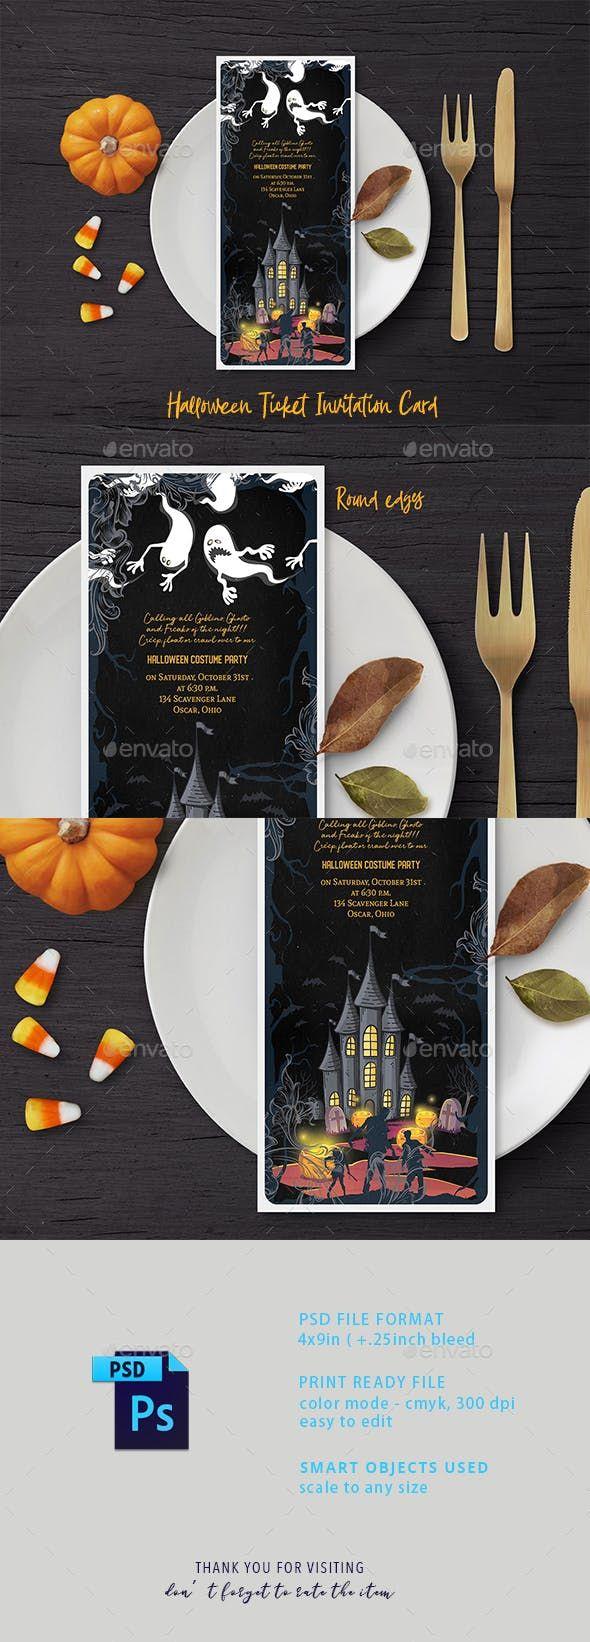 Halloween Ticket Invitation Card Ticket invitation